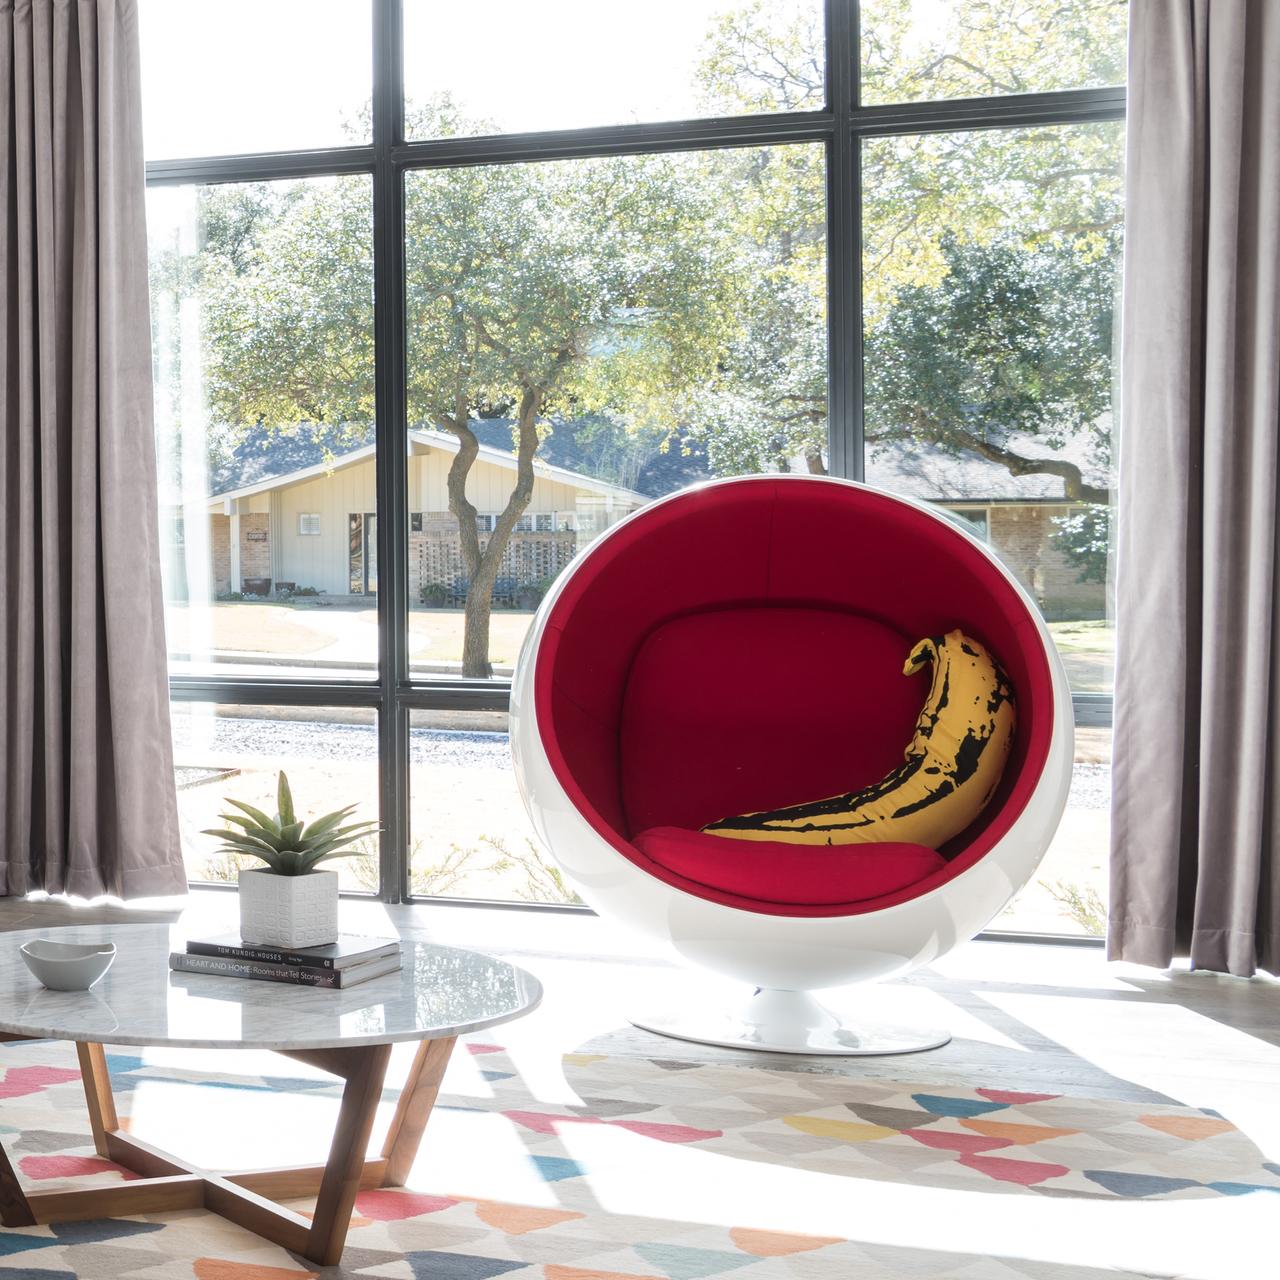 Pleasing Classic Sphere Chair Inzonedesignstudio Interior Chair Design Inzonedesignstudiocom